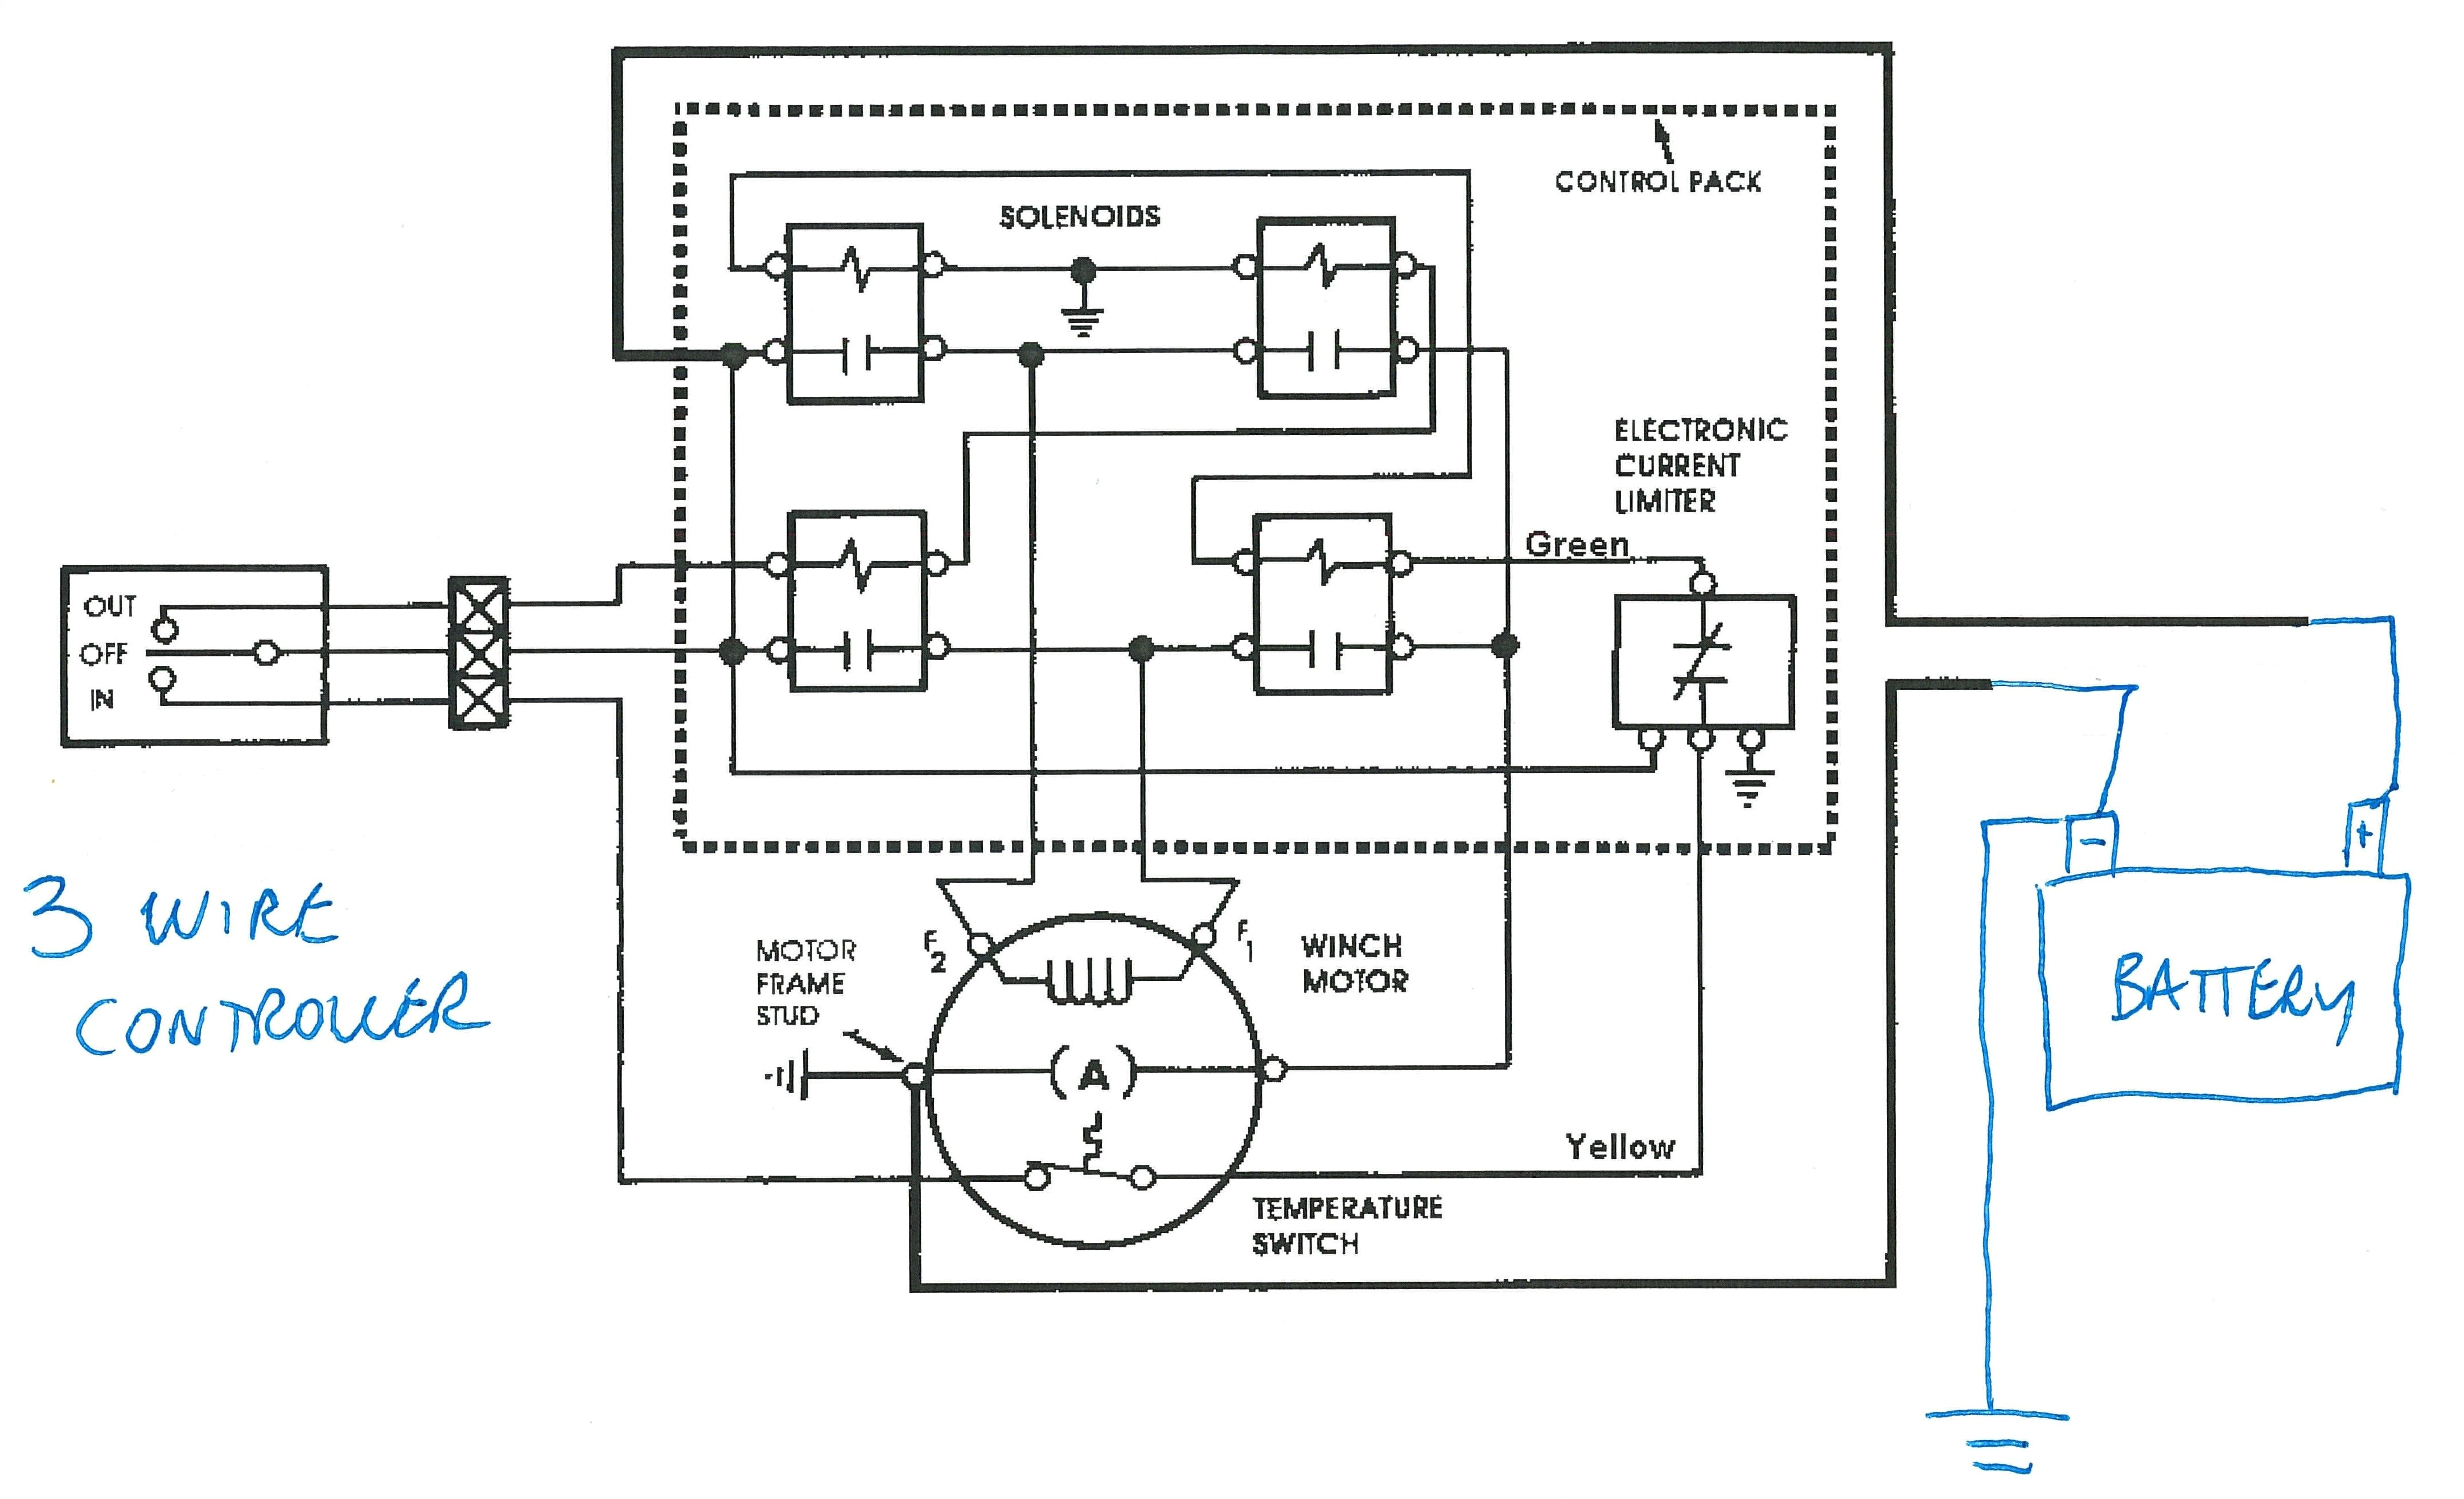 splendi 12v electric winch wiringiagram blog jpg